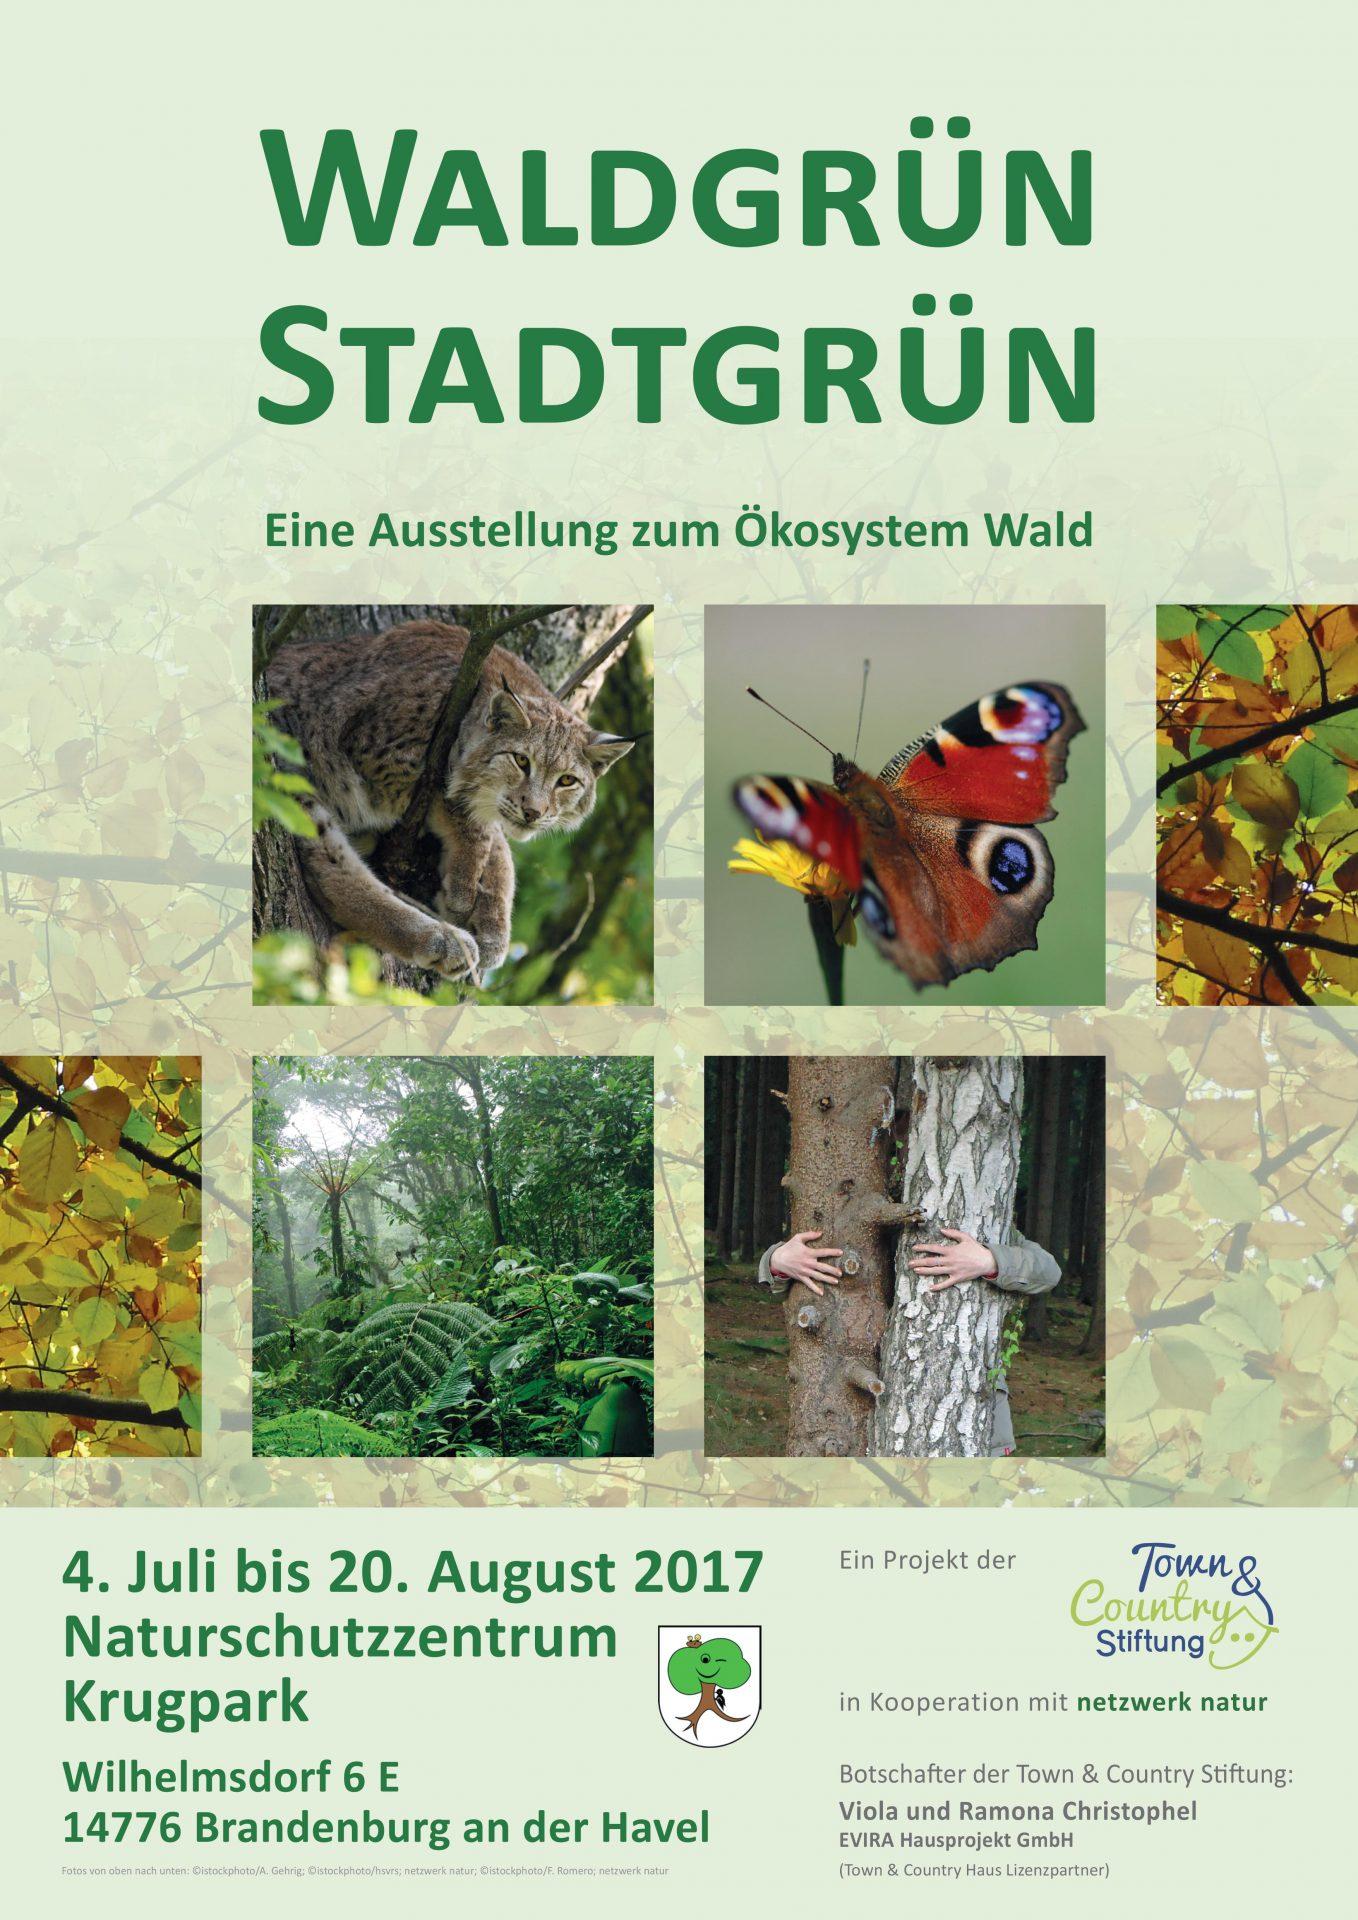 netzwerk natur, Plakat zur Wanderausstellung WALDGRÜN - STADTGRÜN, Naturschutzzentrum Krugpark Brandenburg an der Havel